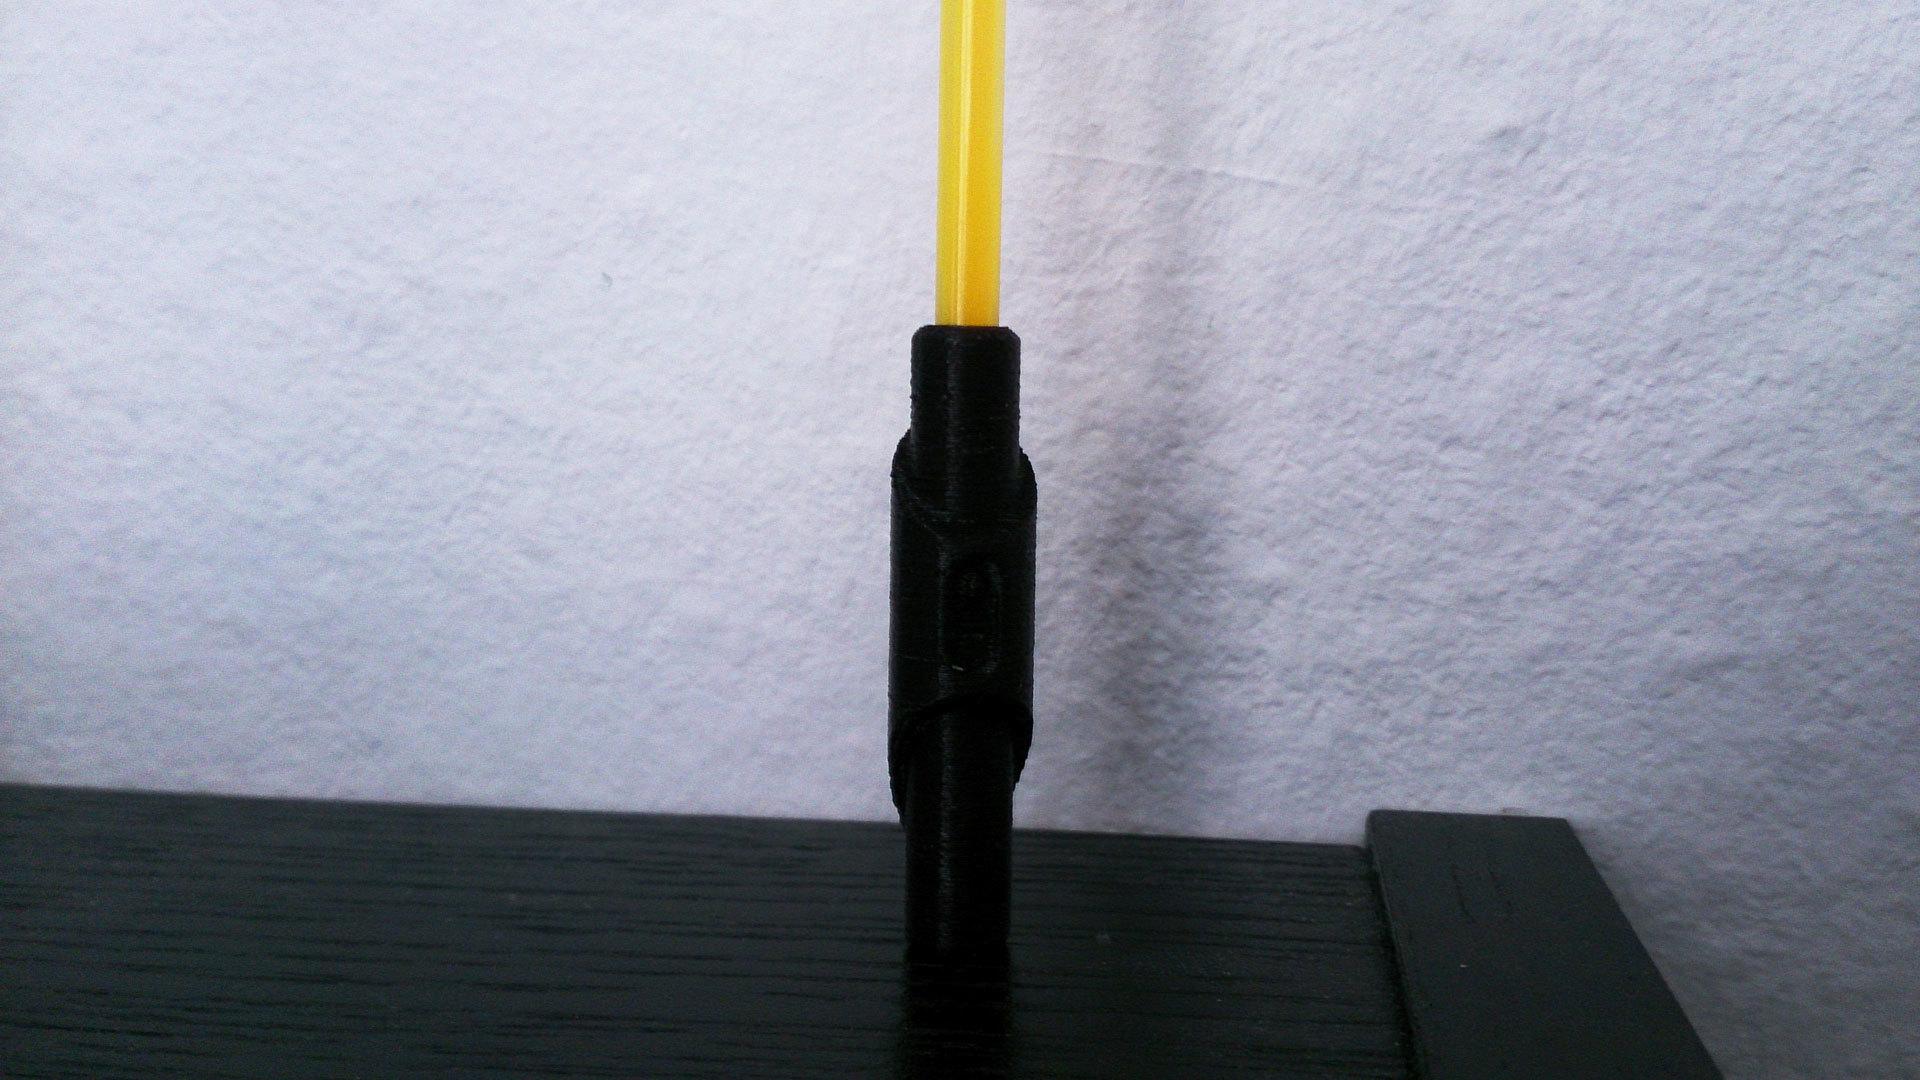 2.jpg Download free STL file Glow Stick Saber • 3D printer object, Shruikan-Arts